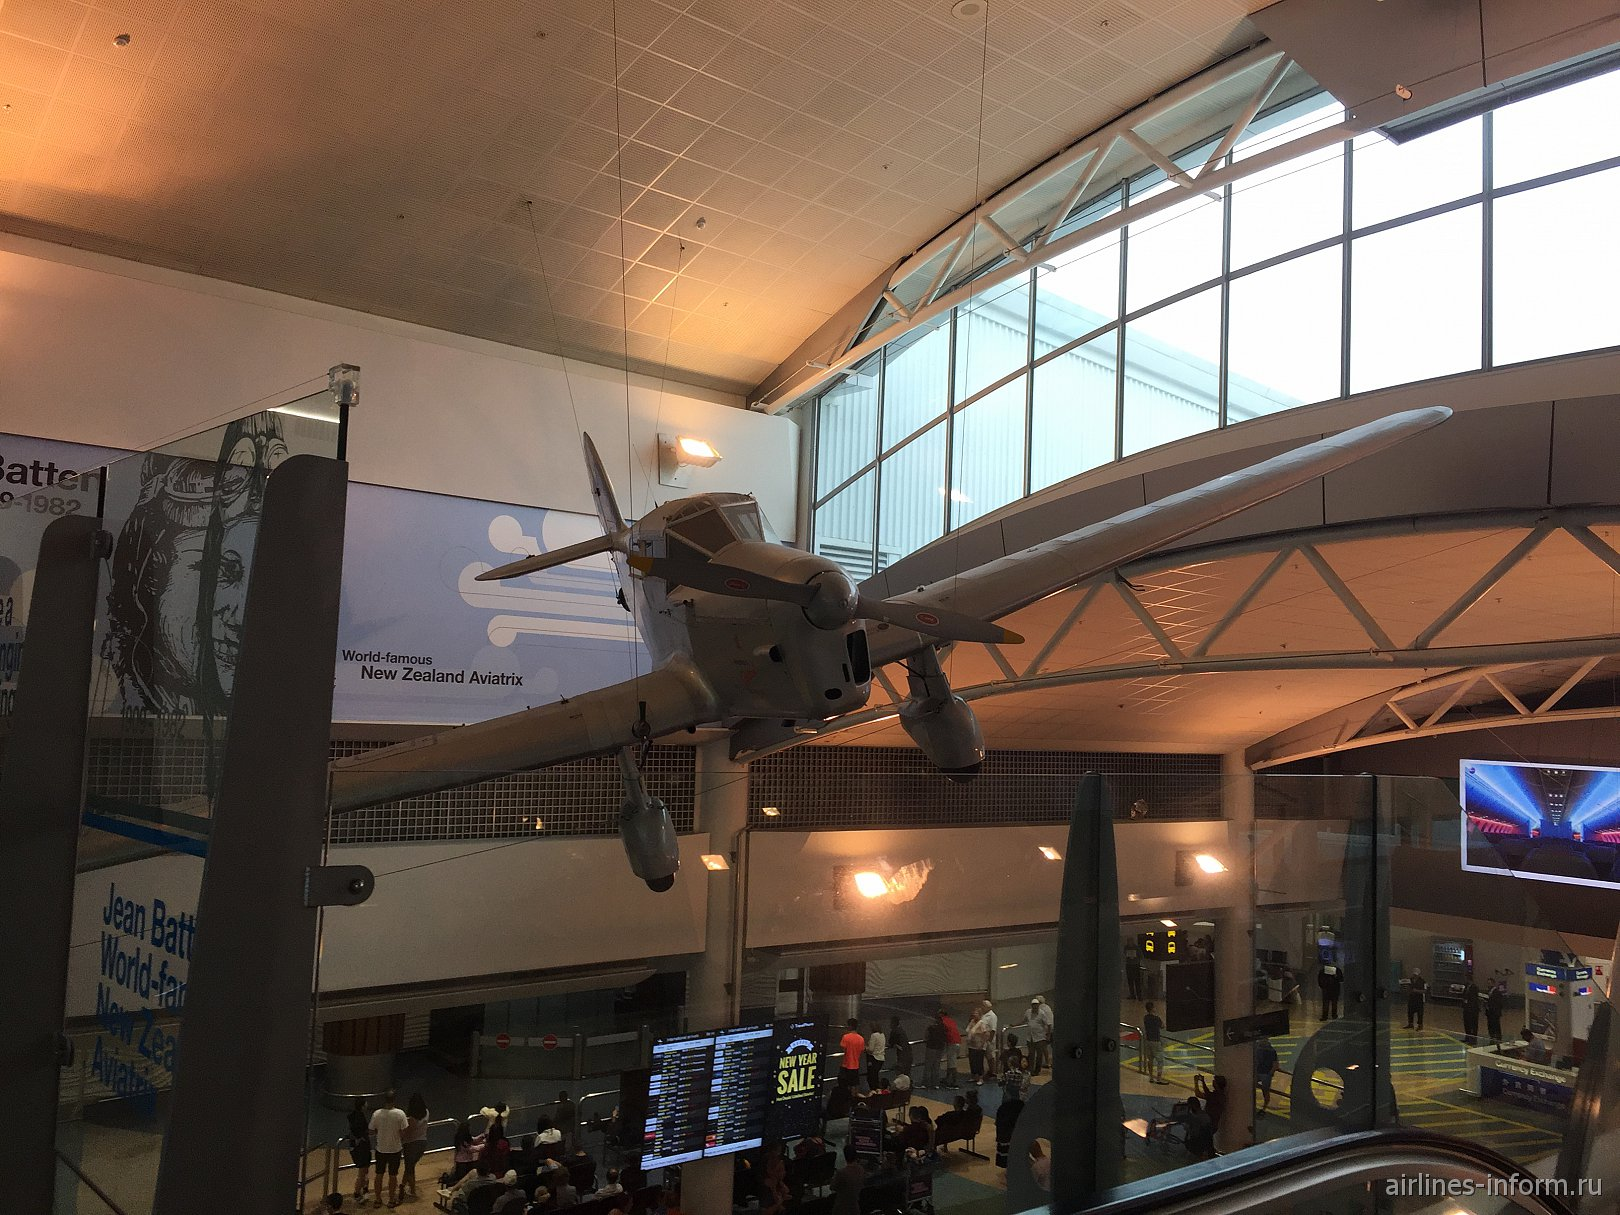 Самолет Percival Gull Джины Баттен в аэропорту Окленд, Новая Зеландия